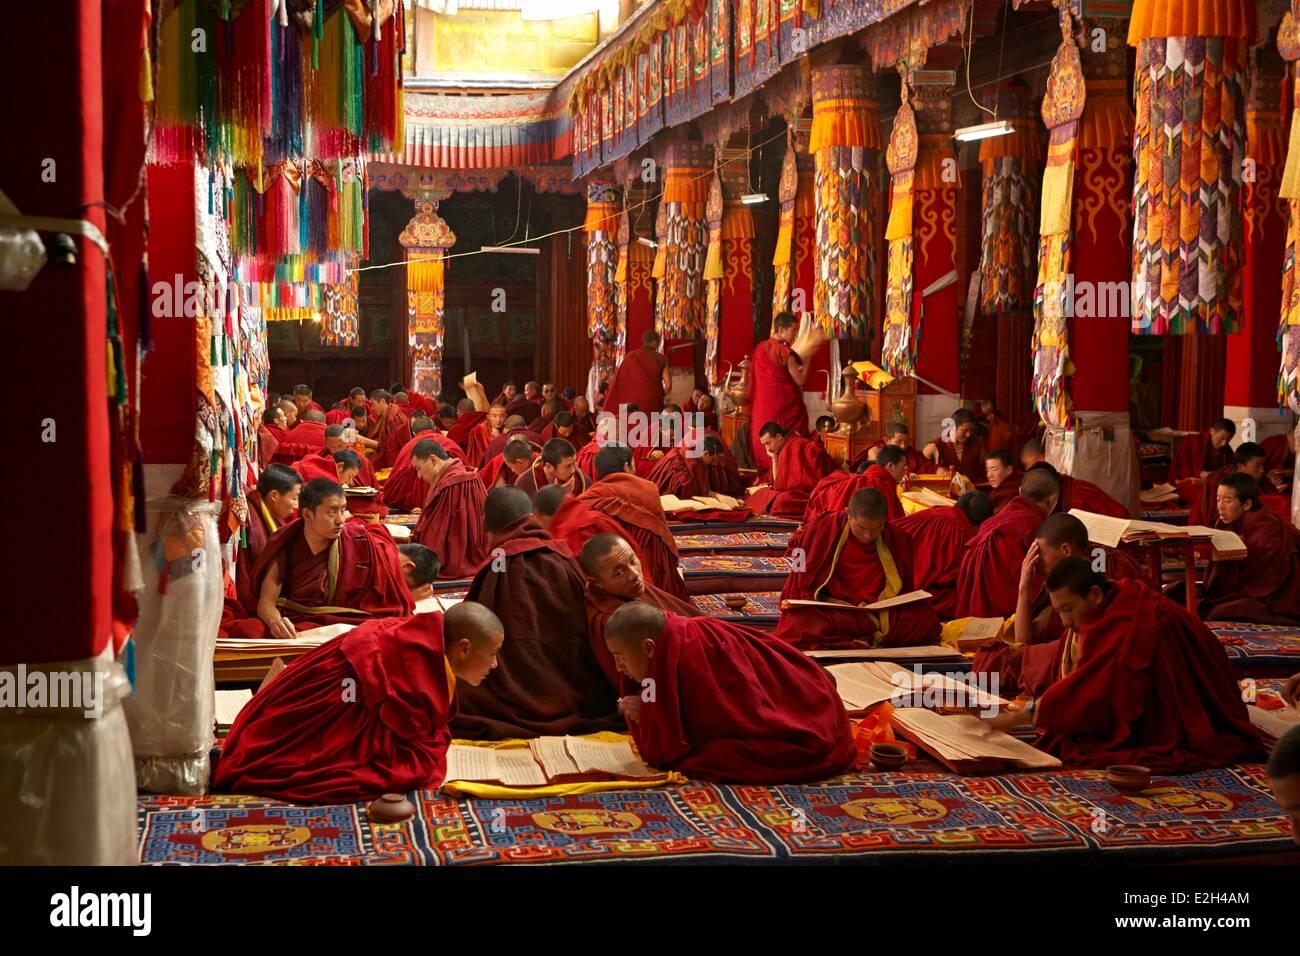 China Tibet Lhassa buddhist religious ceremony at Drepung monastery - Stock Image